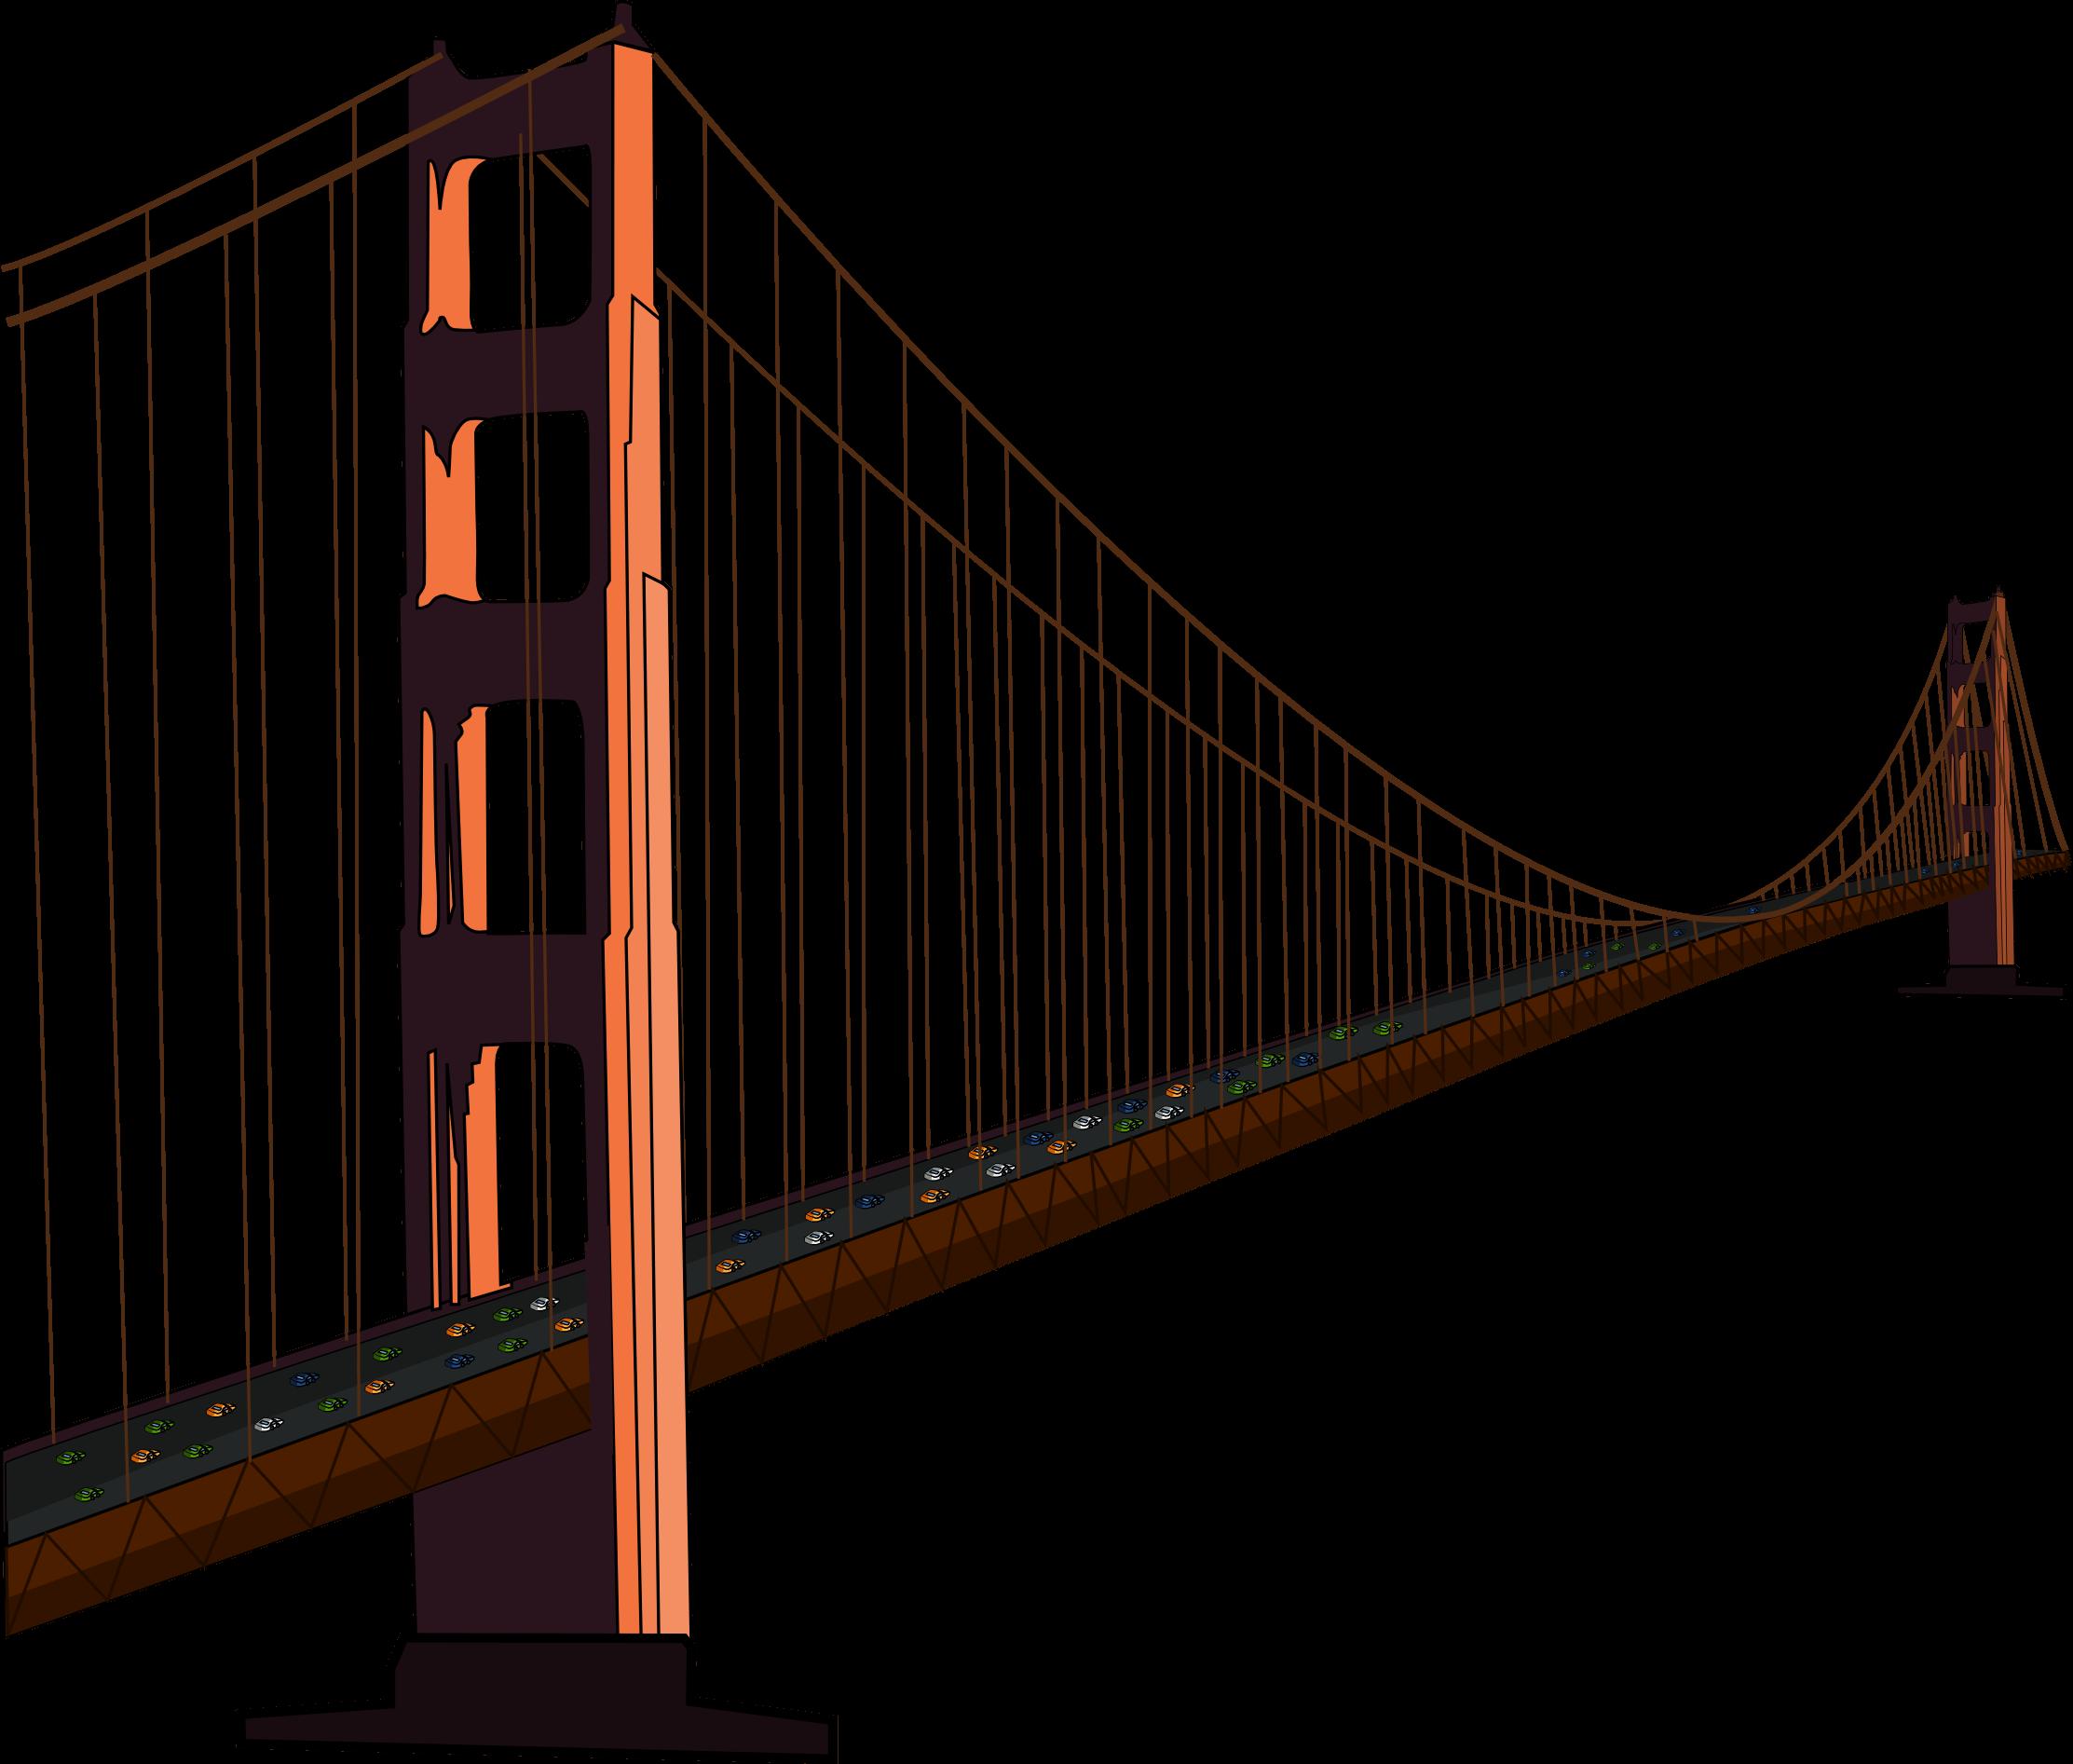 Simple california cliparts golden. Bridge clipart outline